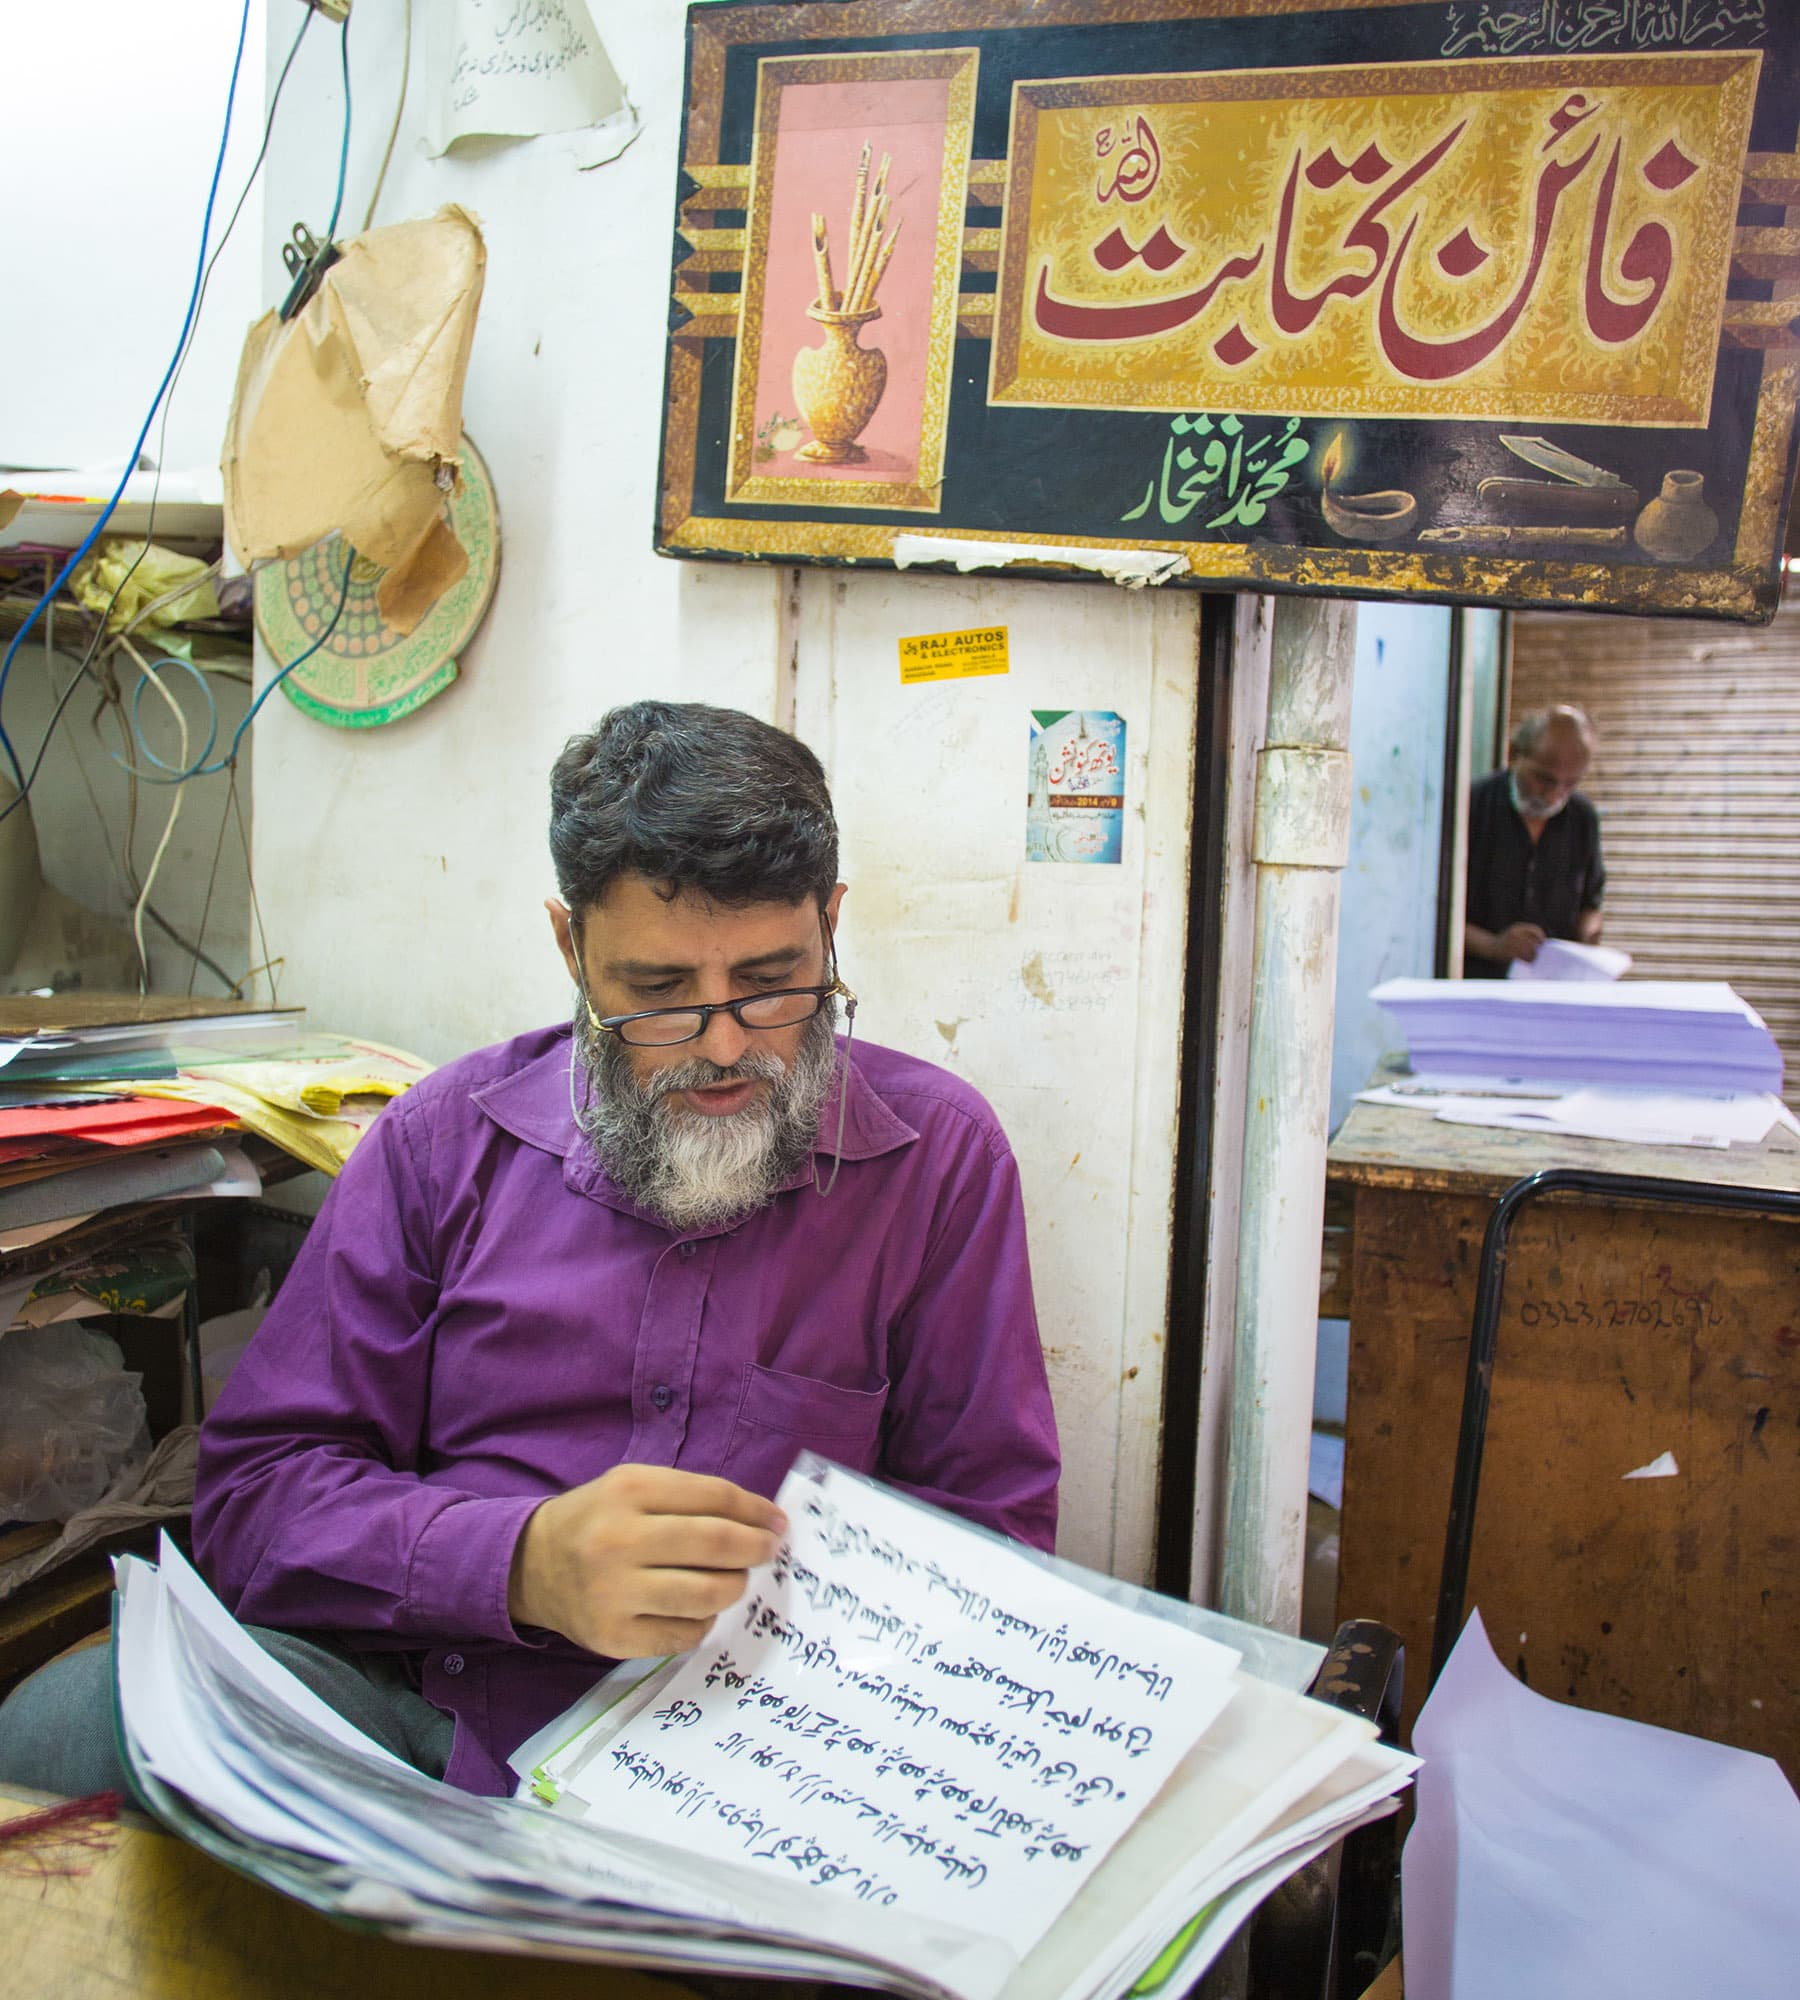 Muhammad Iftikhar in his roadside shop at Pakistan Chowk.